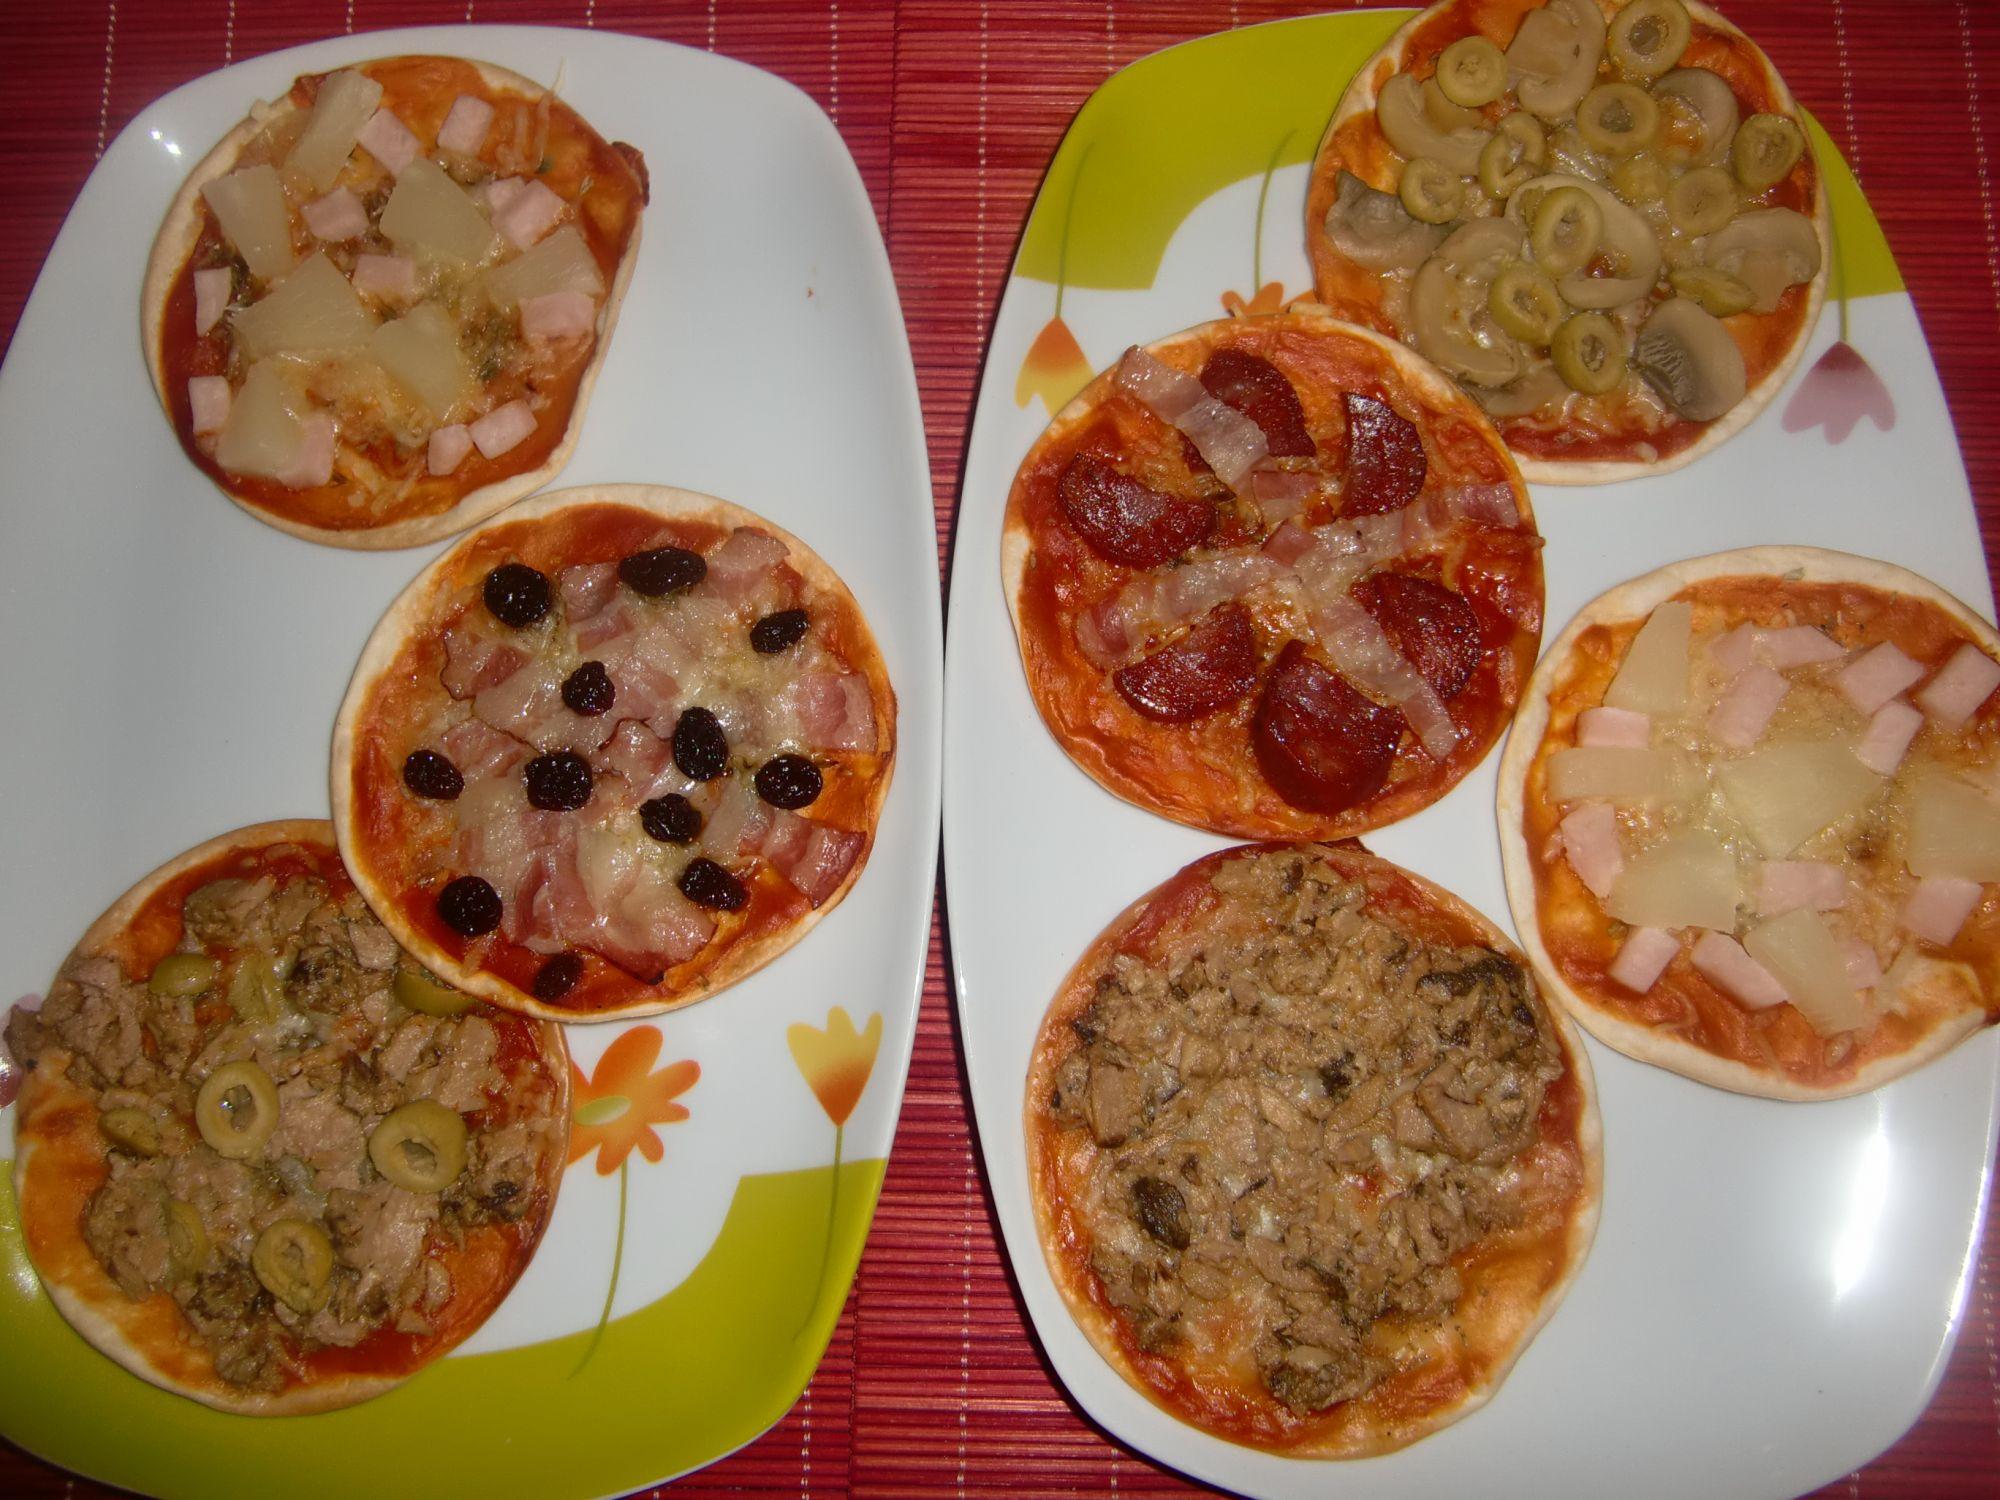 Minipizzas De Oblea De Empanadilla 3 8 5